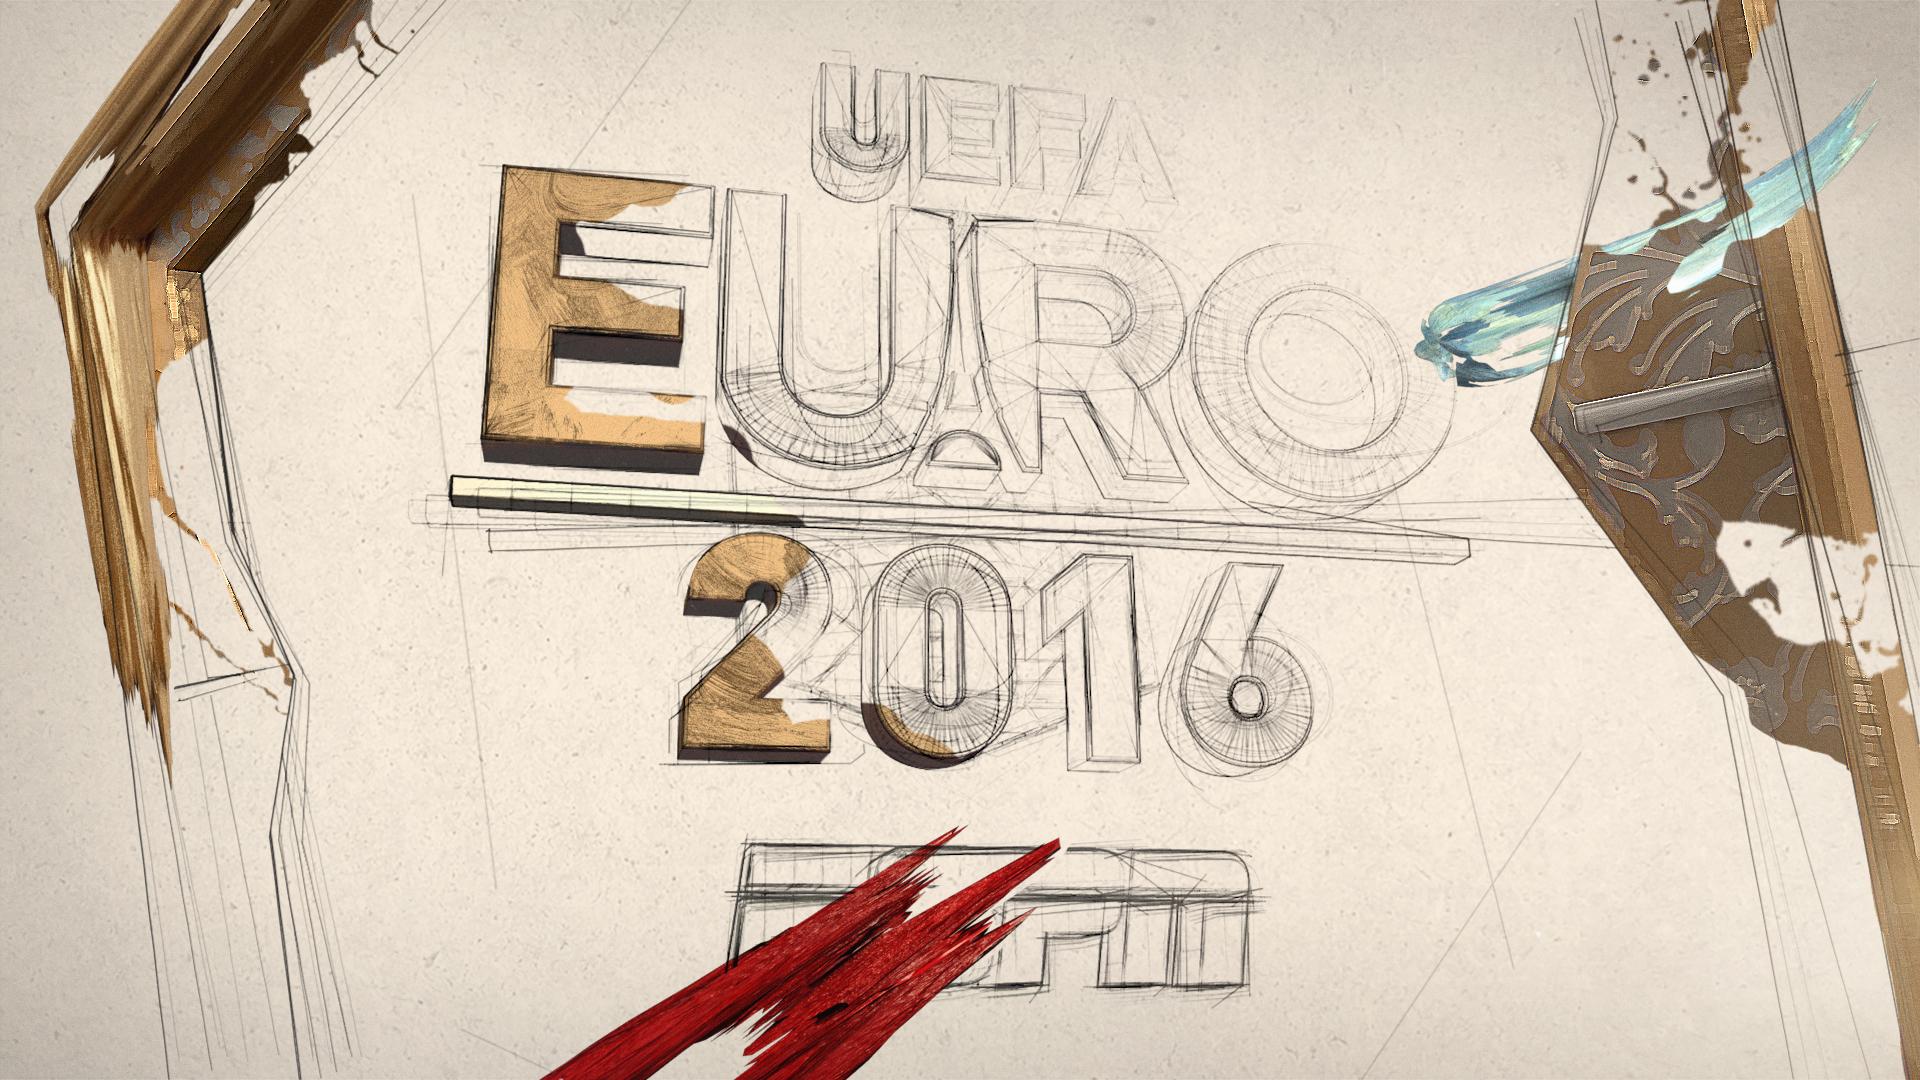 espn_EURO_logo_f01_v2